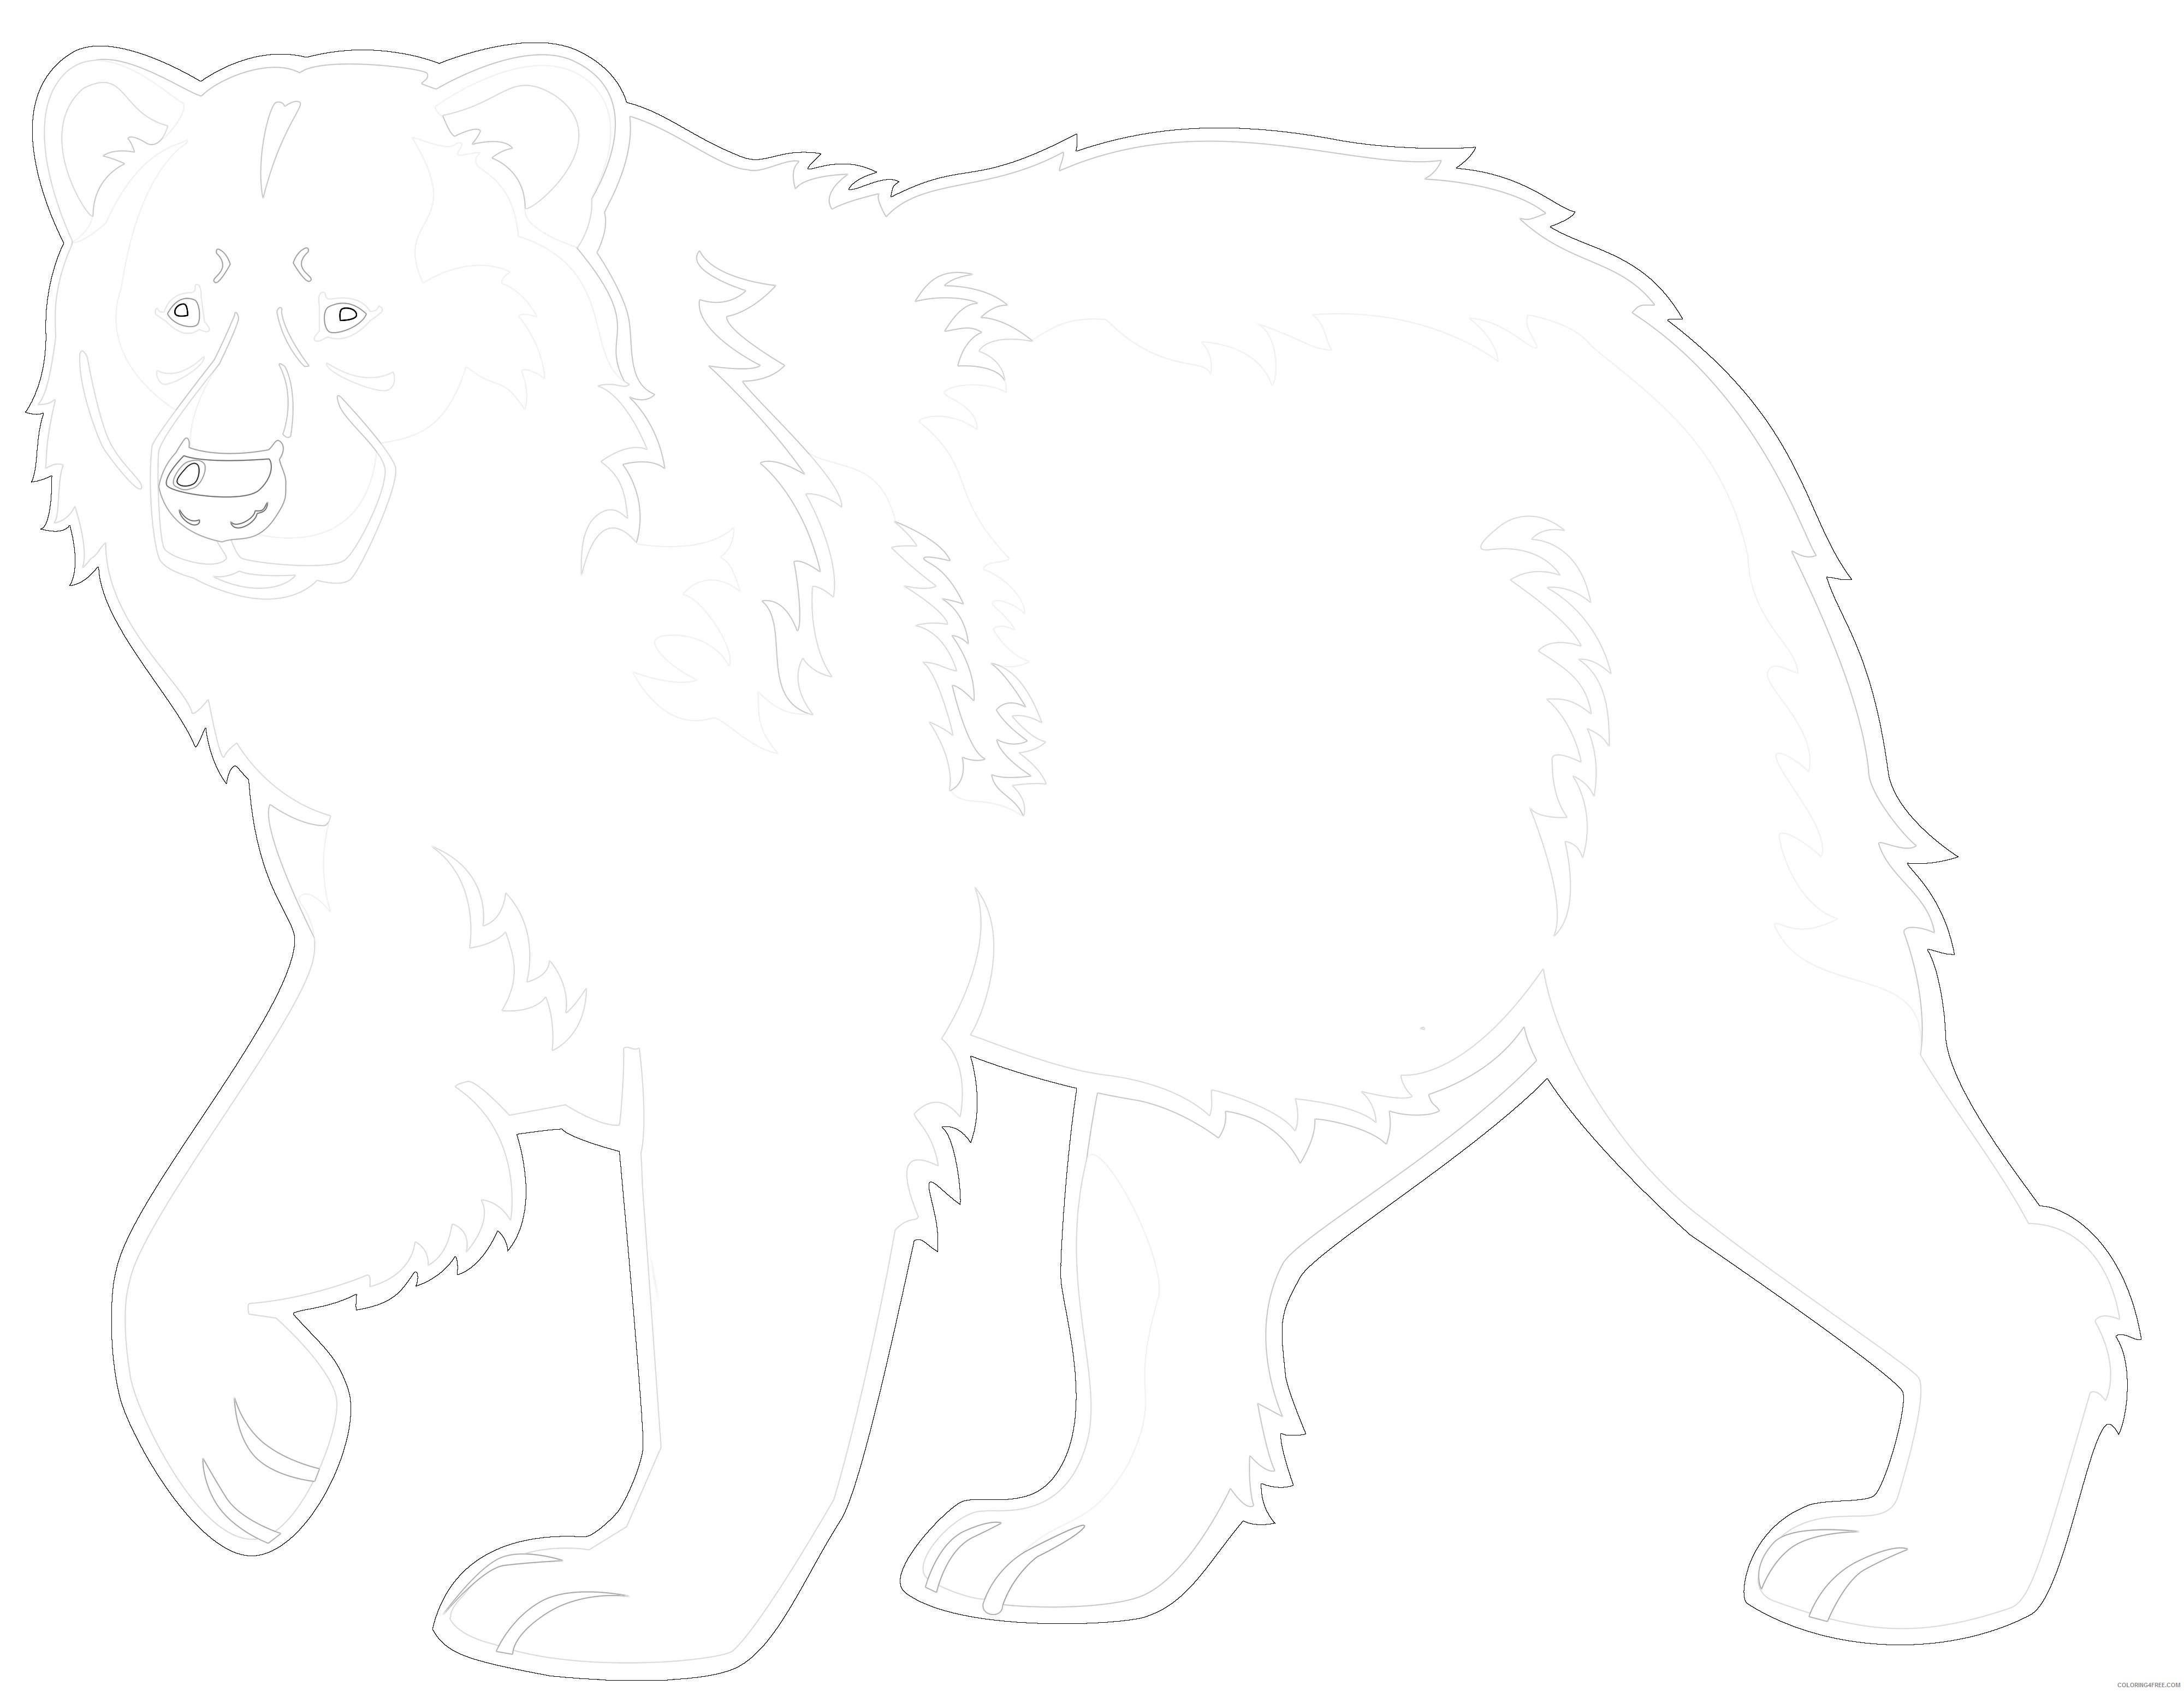 bear polar bear pics 2wiz 2 coloring